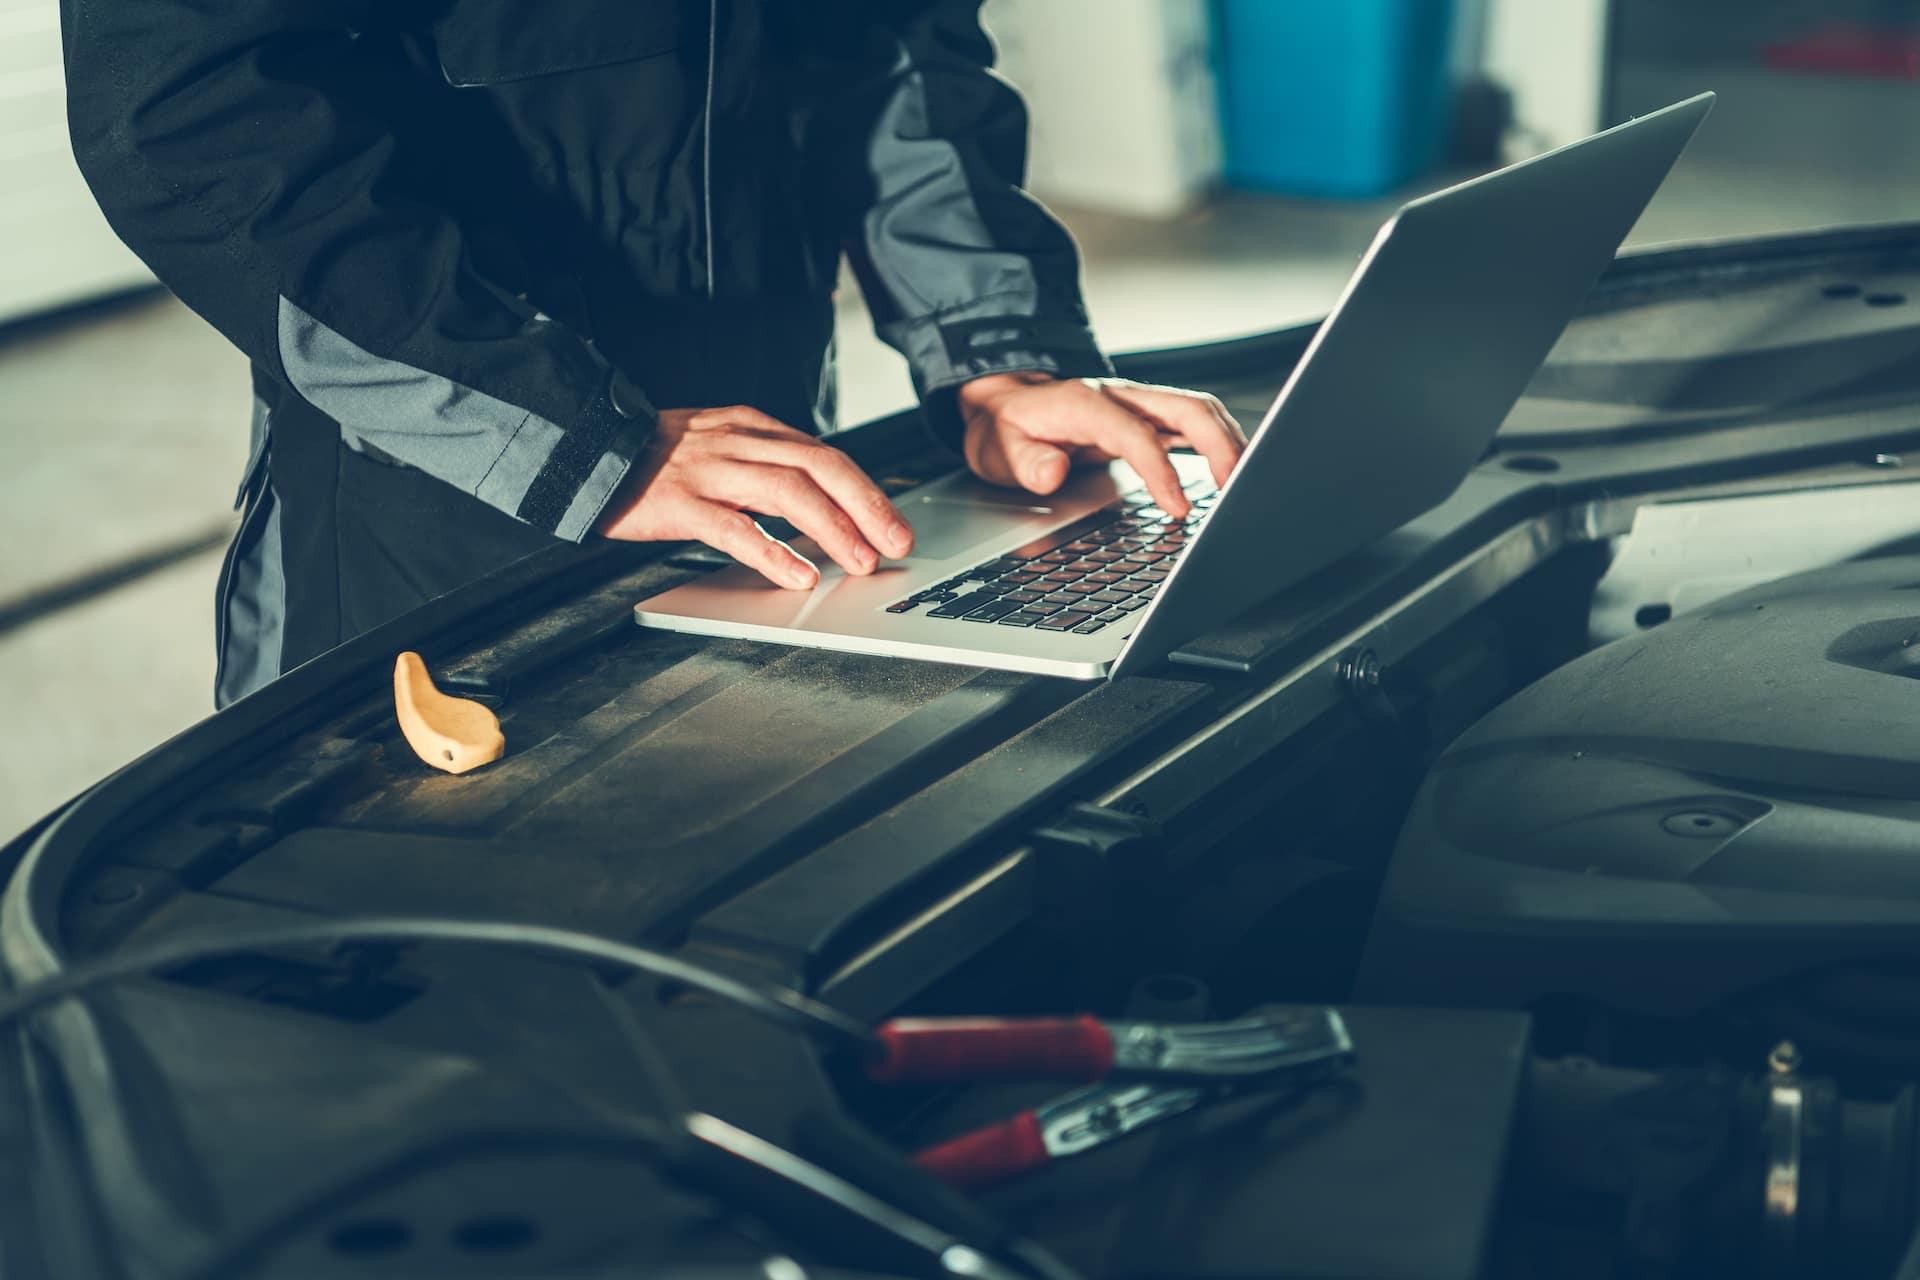 Mechanic typing on laptop | Bennett Maserati of Allentown is a Car Dealership near East Stroudsburg PA in Allentown